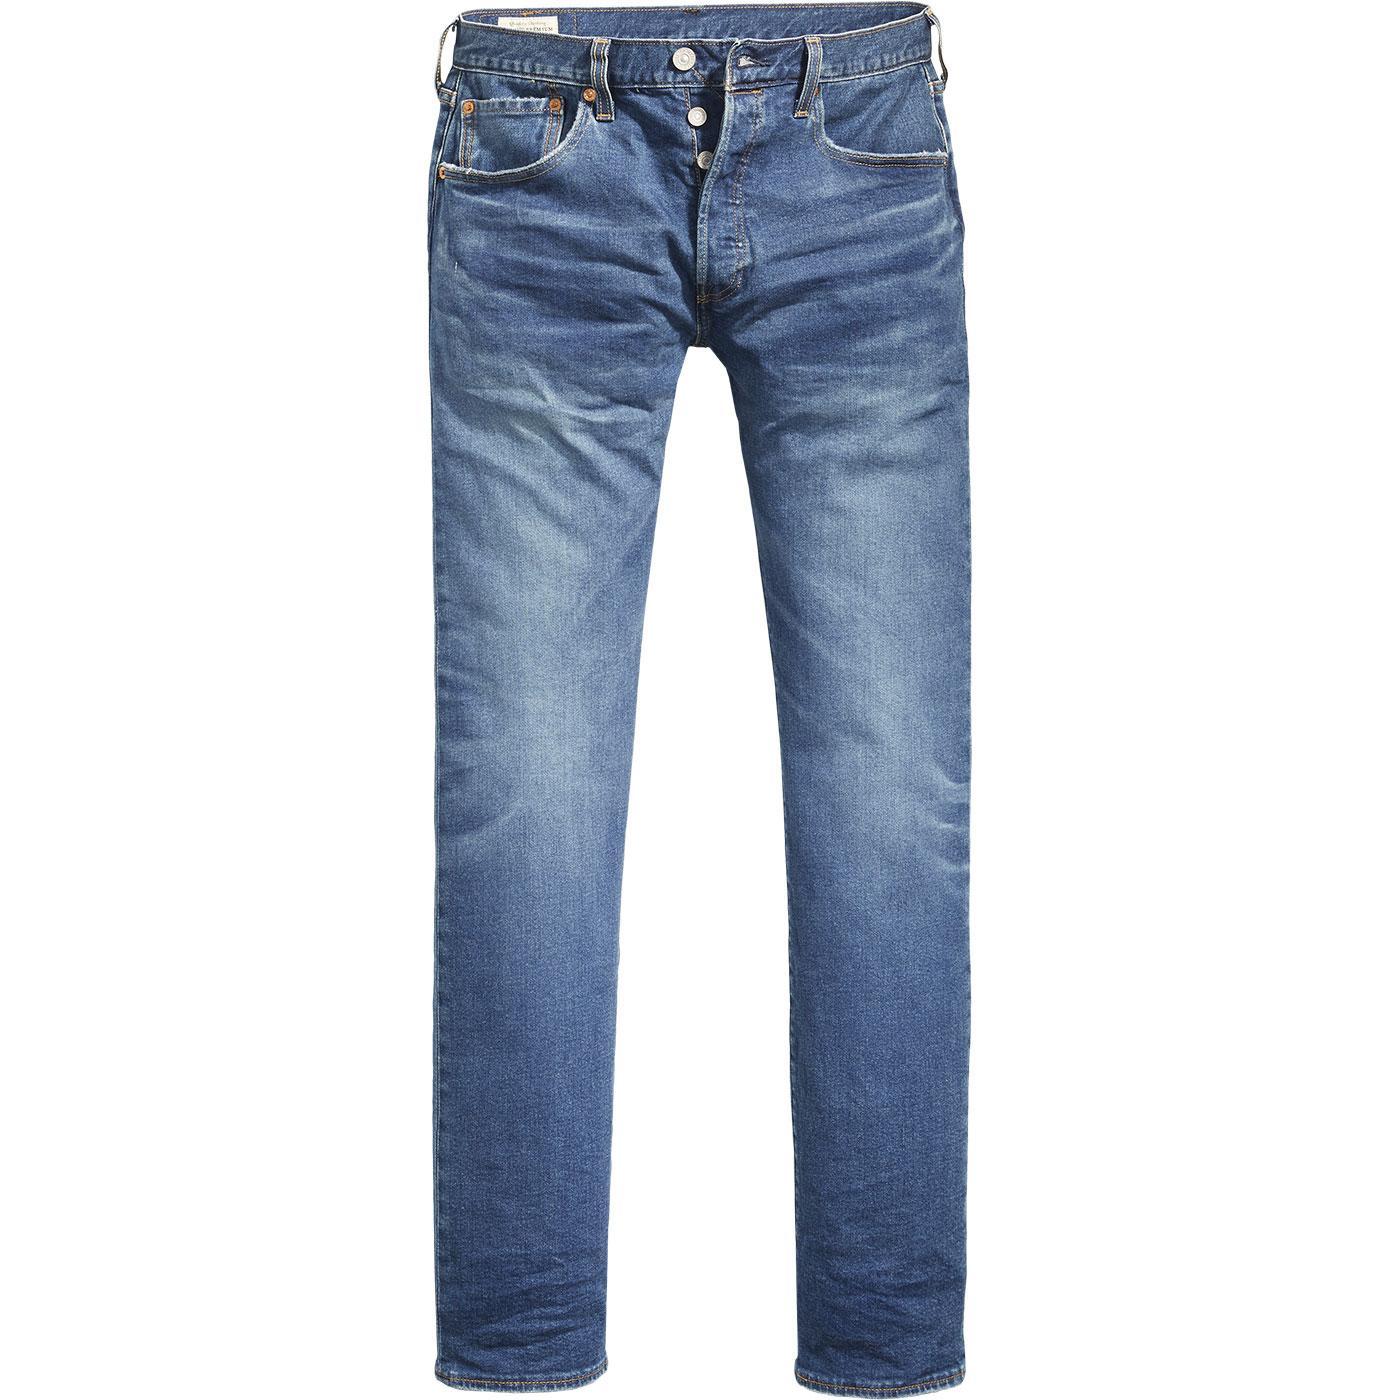 LEVI'S 501 Original Straight Jeans (Key West Sky)